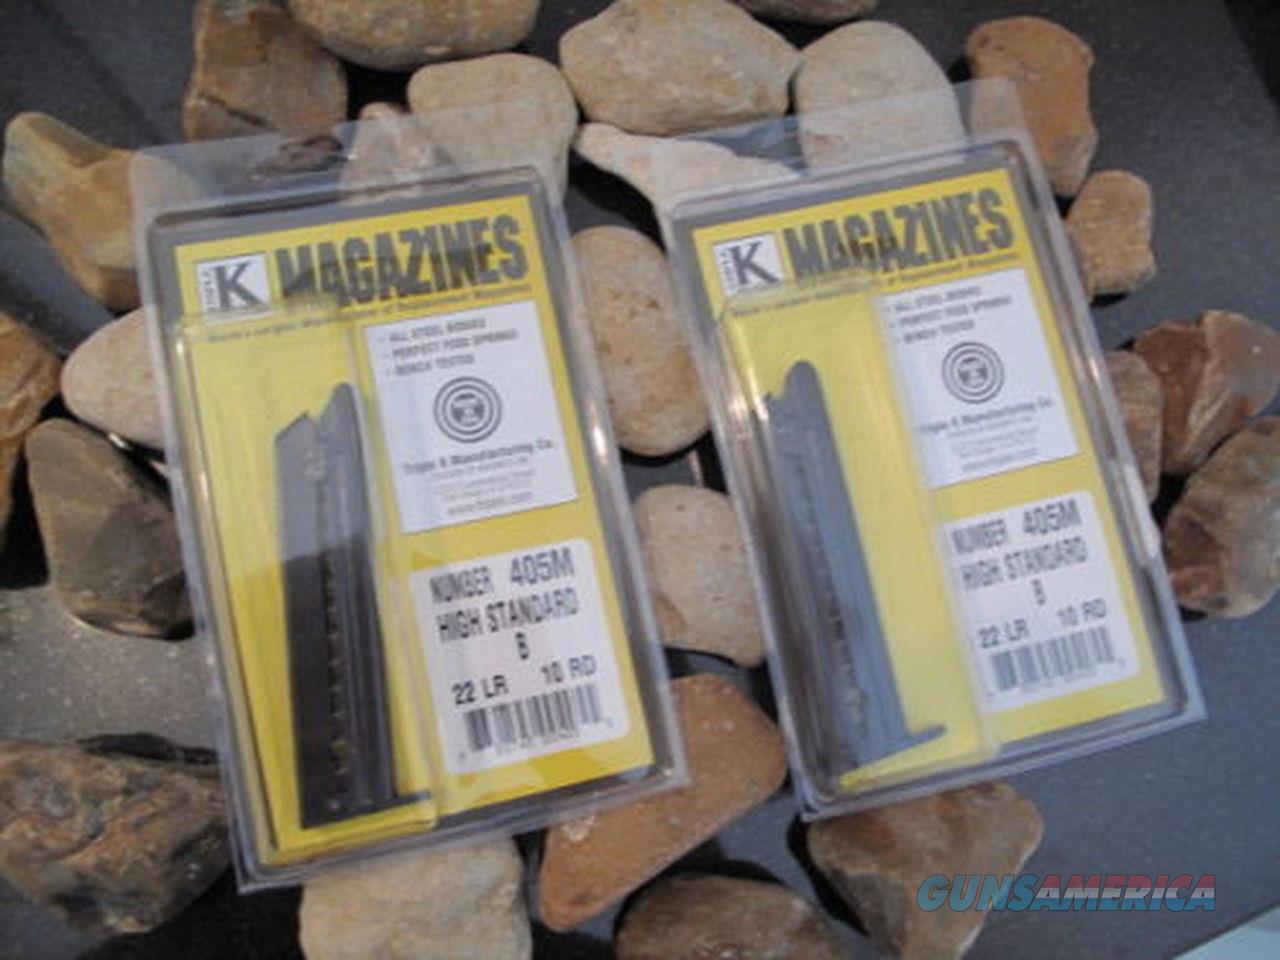 2-Pack Fits HIGH STANDARD MAGAZINE Fits MODEL B B-US HB GB MAG 22 LR 10 RD Mags  Non-Guns > Ammunition